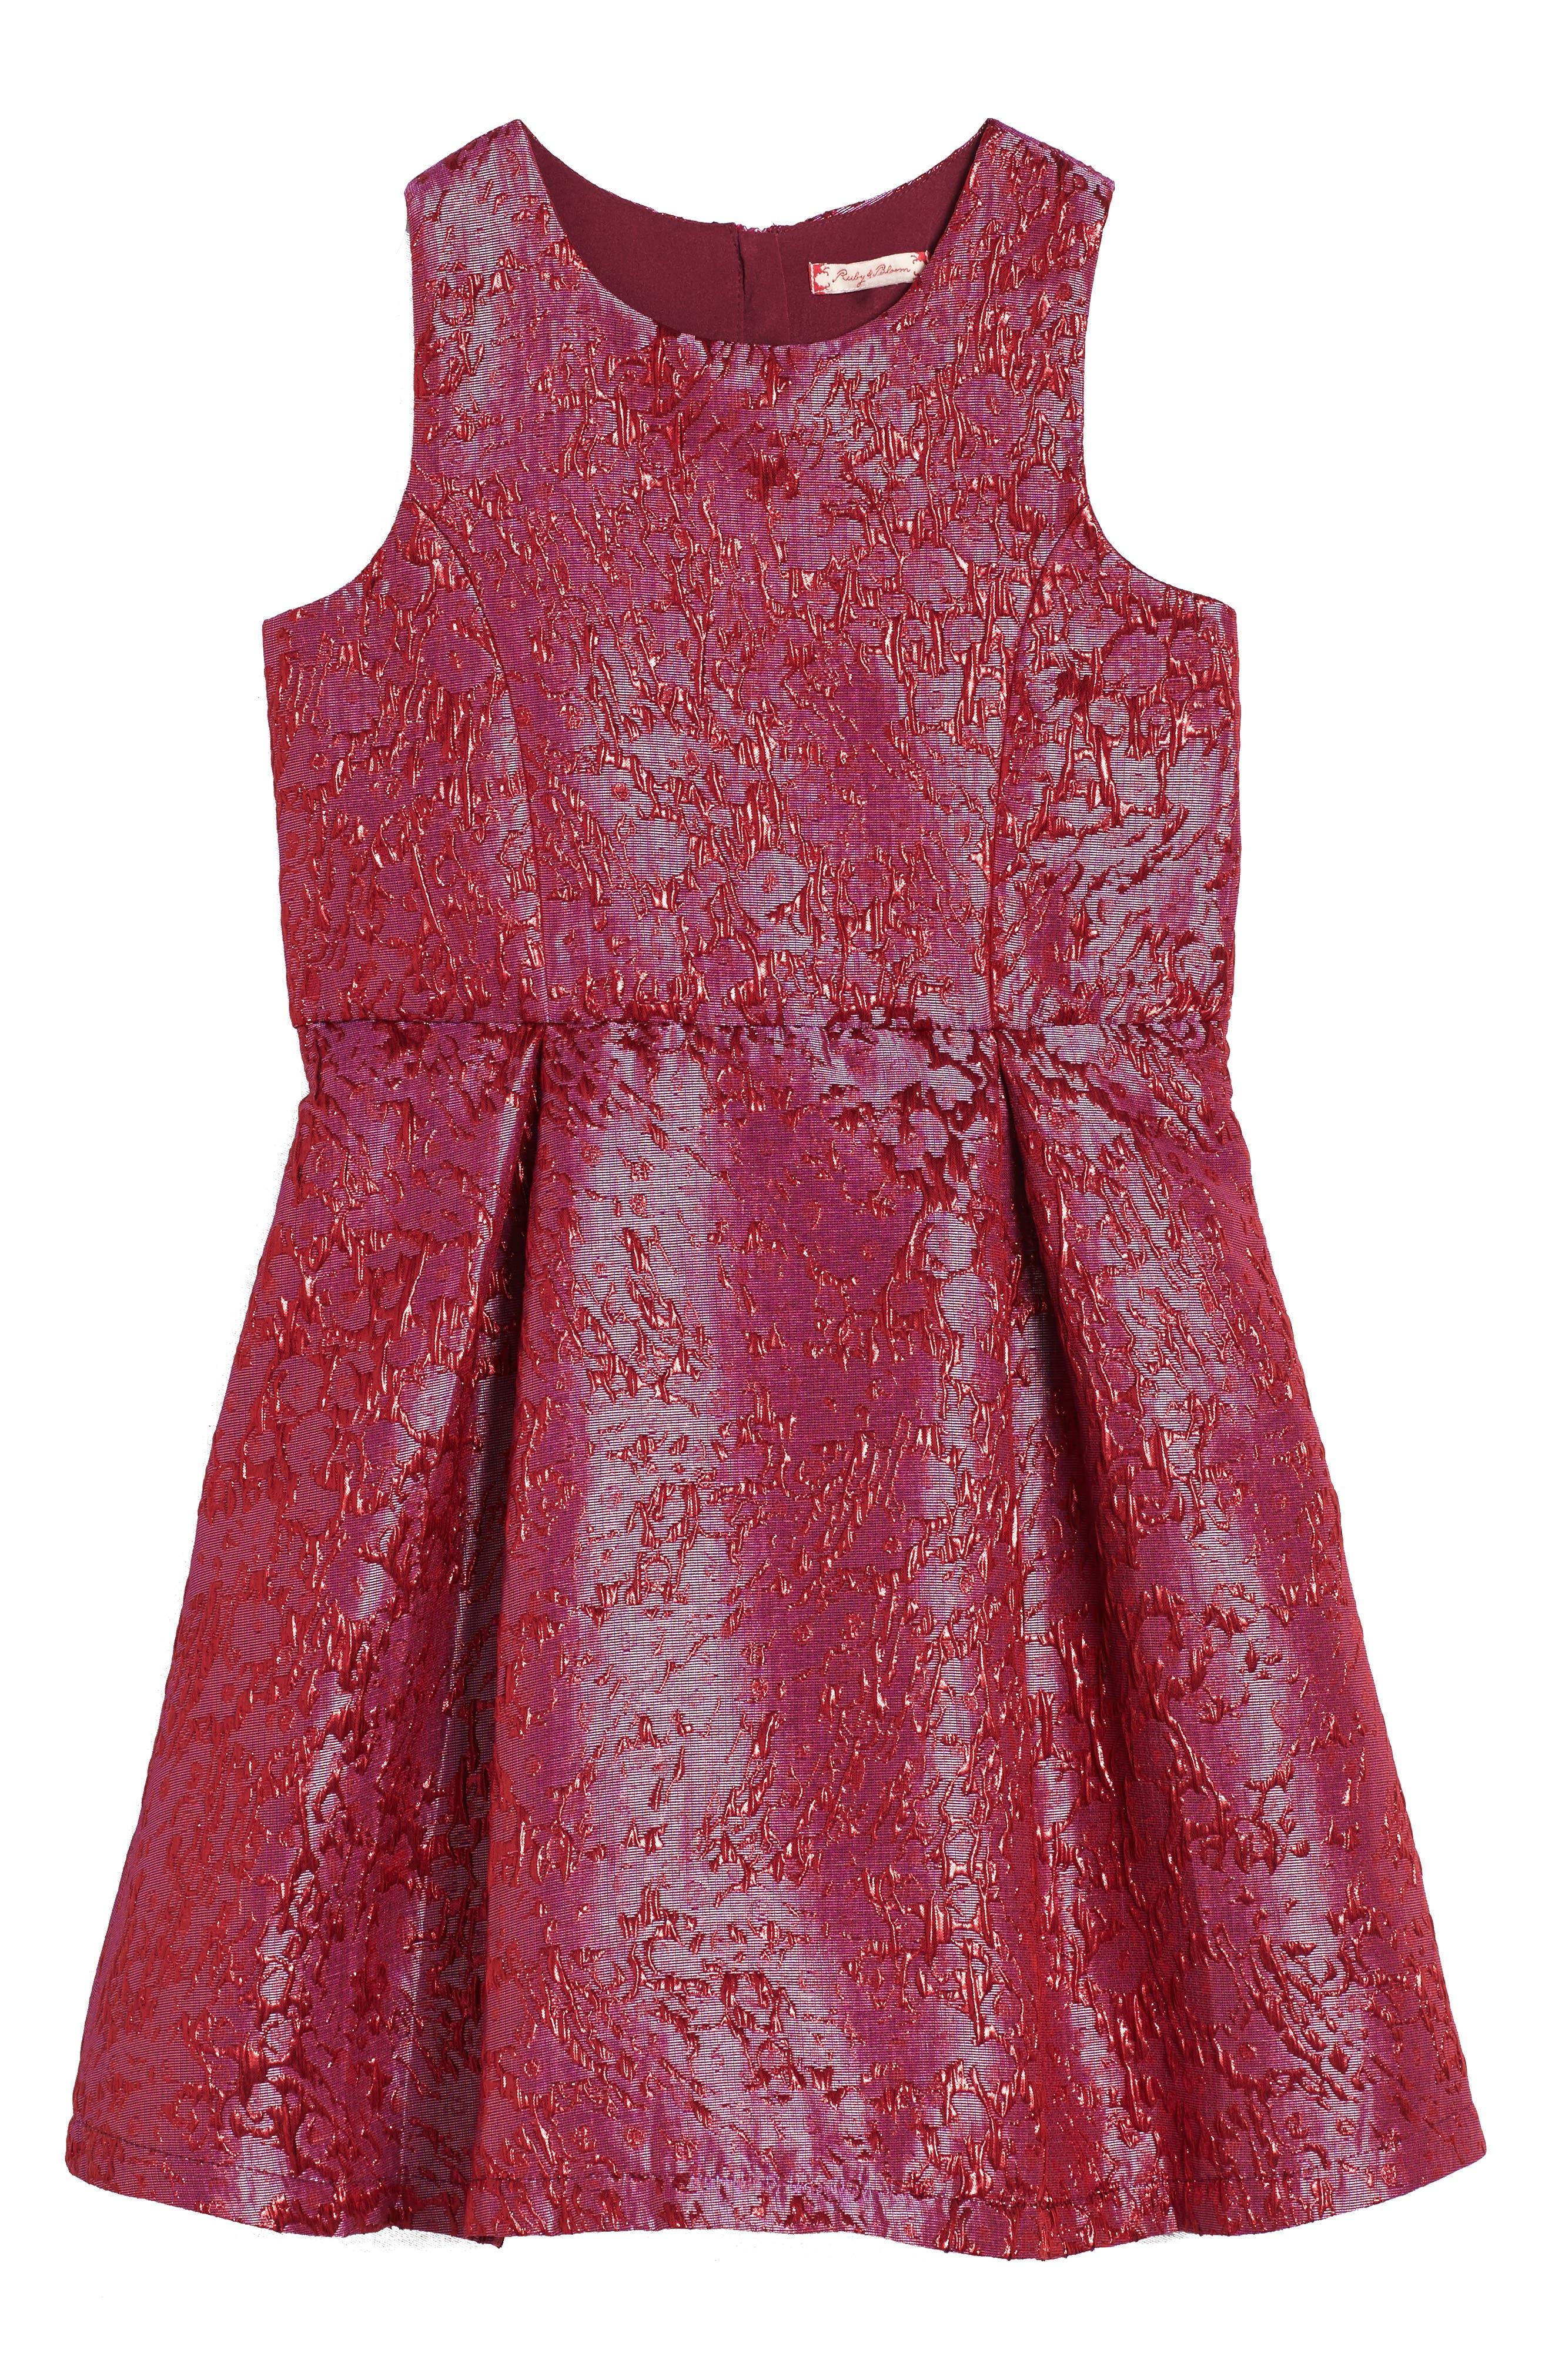 Ruby U0026 Bloom Textured Jacquard Dress (Toddler Girls, Little Girls U0026 Big ...